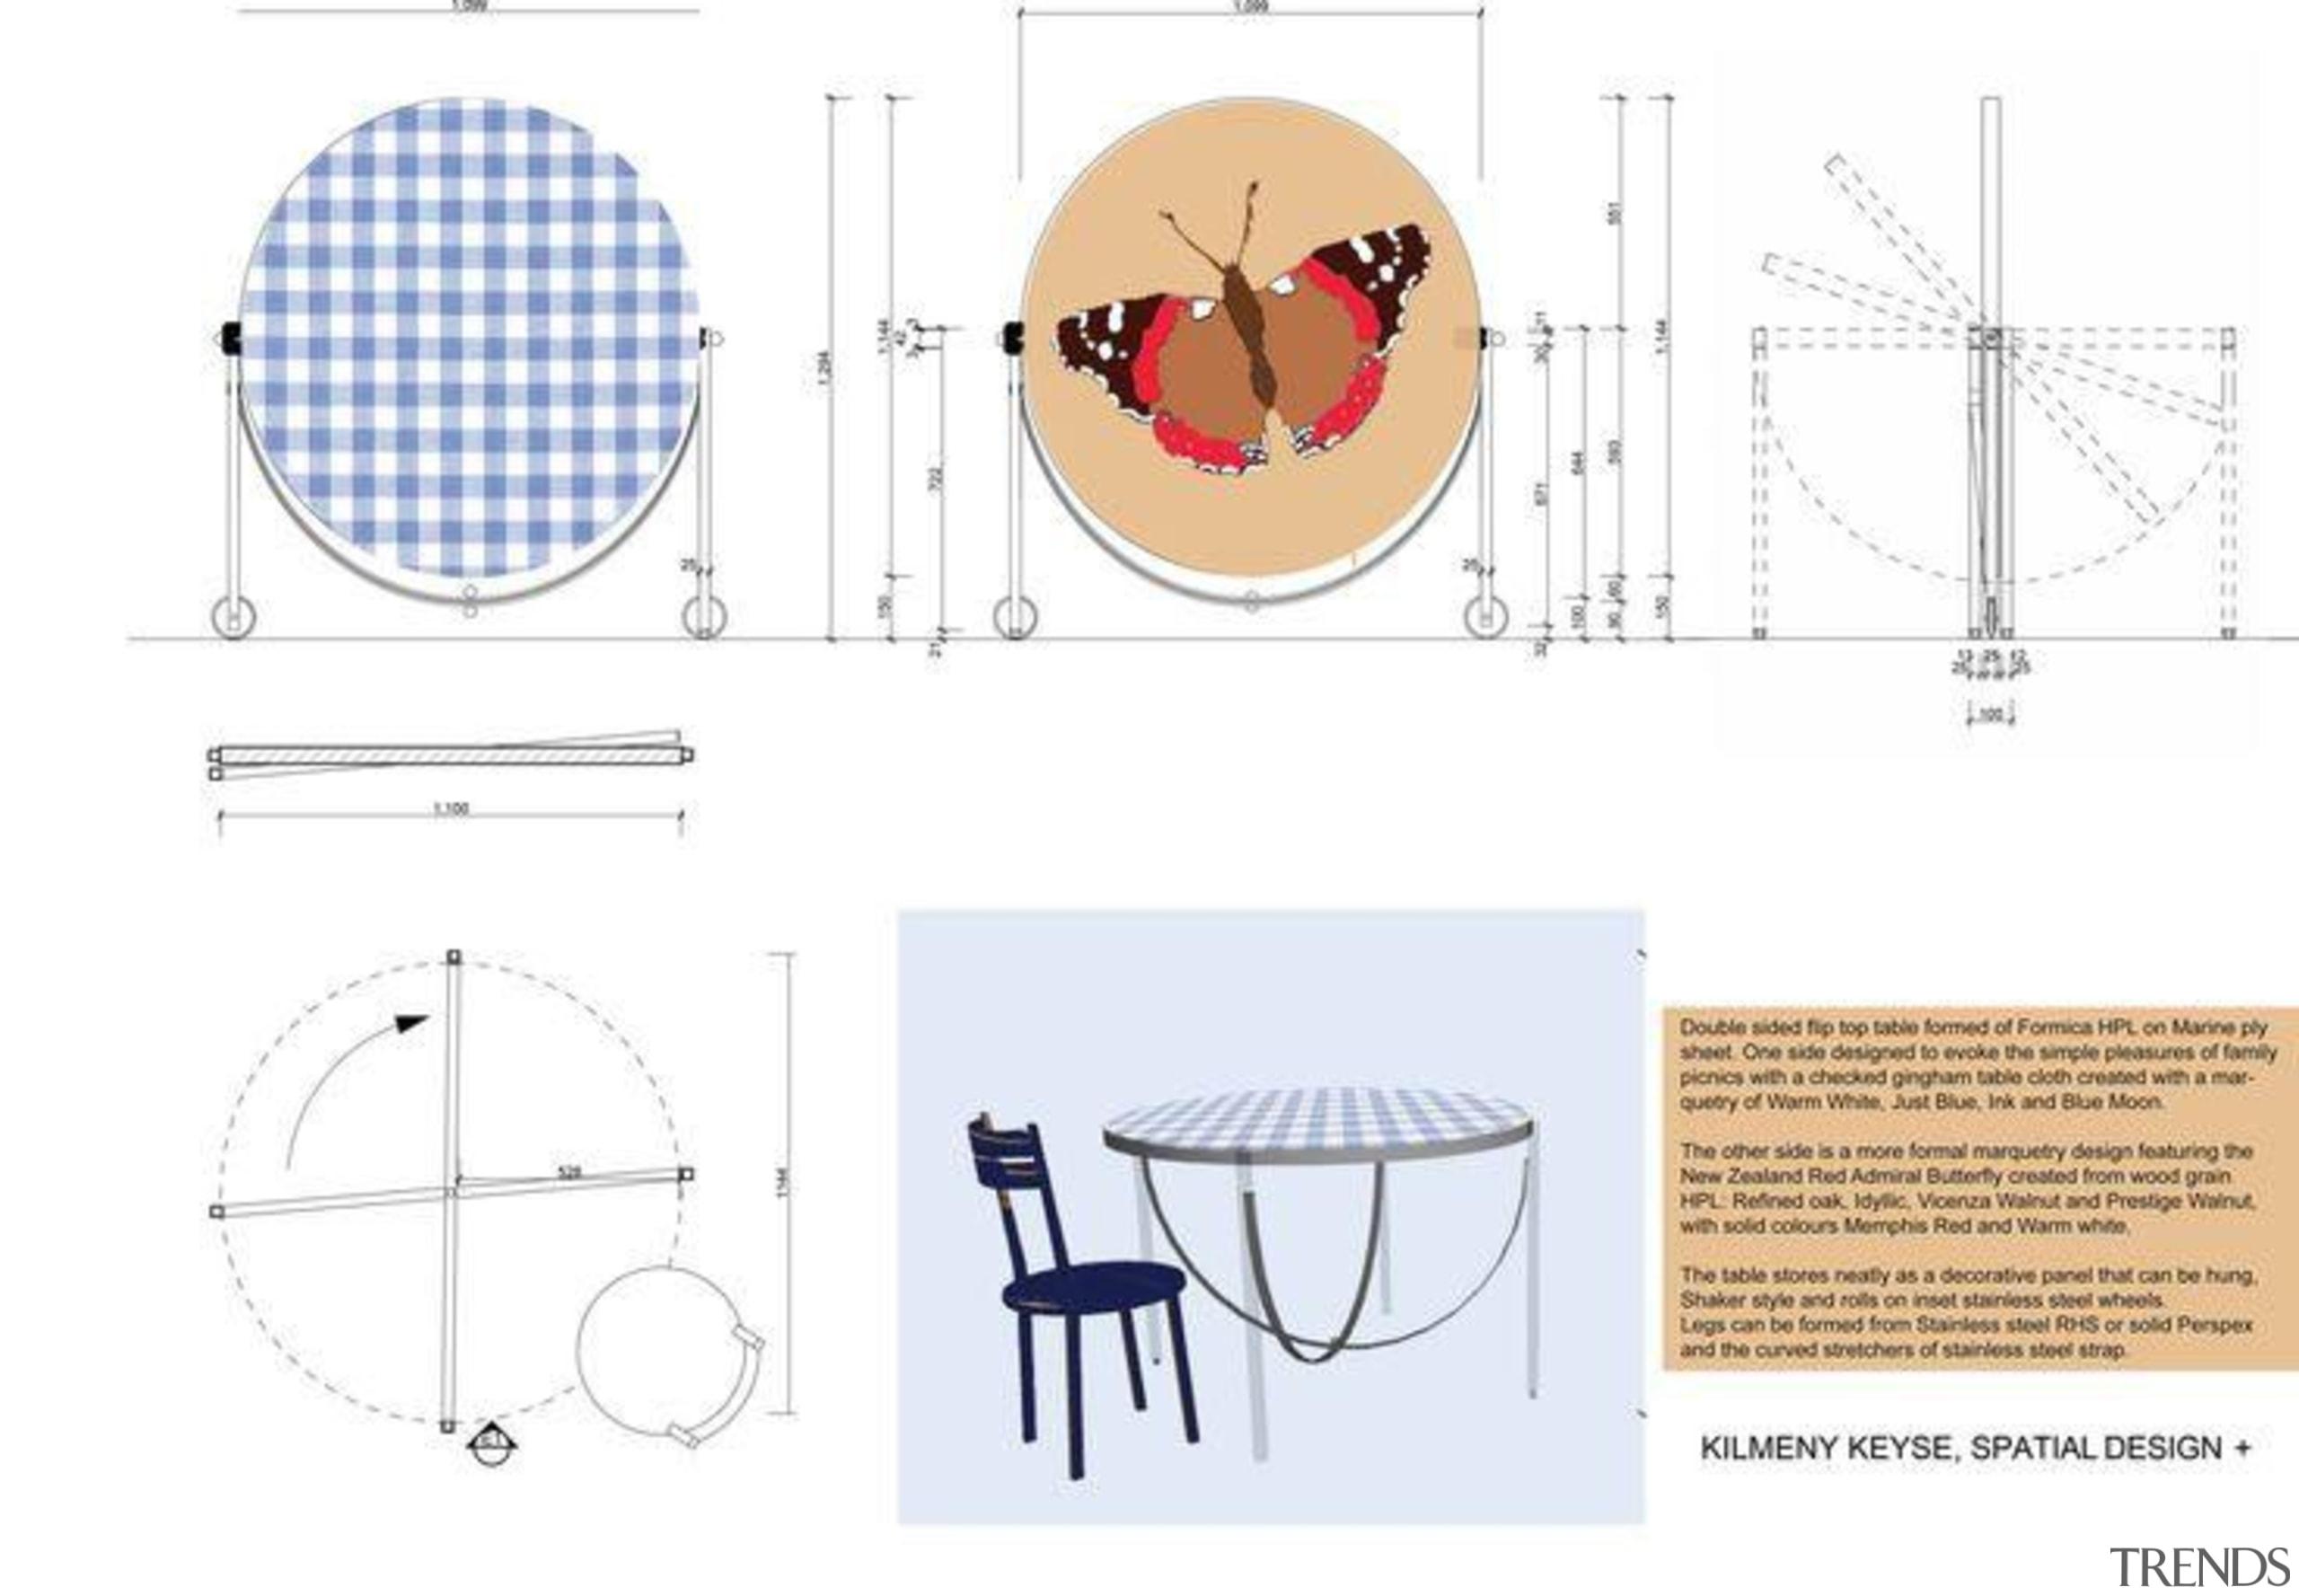 by Kilmeny Keyes - by Kilmeny Keyes - angle, area, circle, design, diagram, font, line, pattern, product, product design, text, white